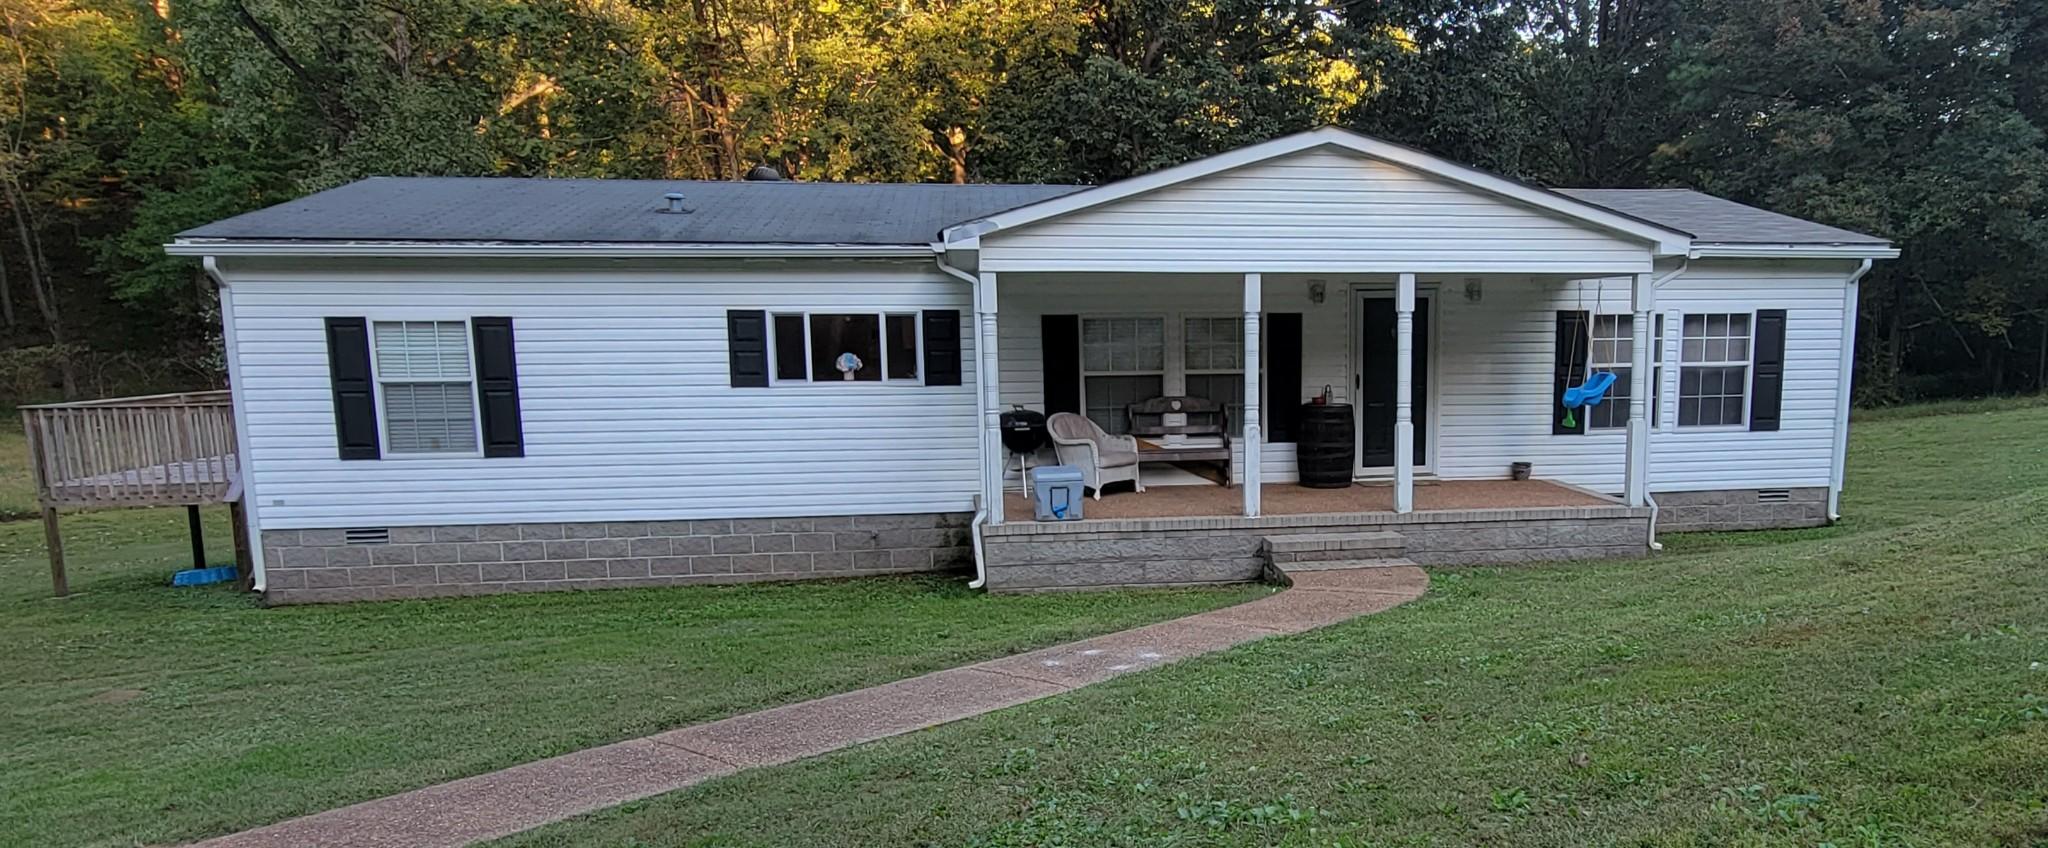 54 Horseshoe Bend Rd Property Photo